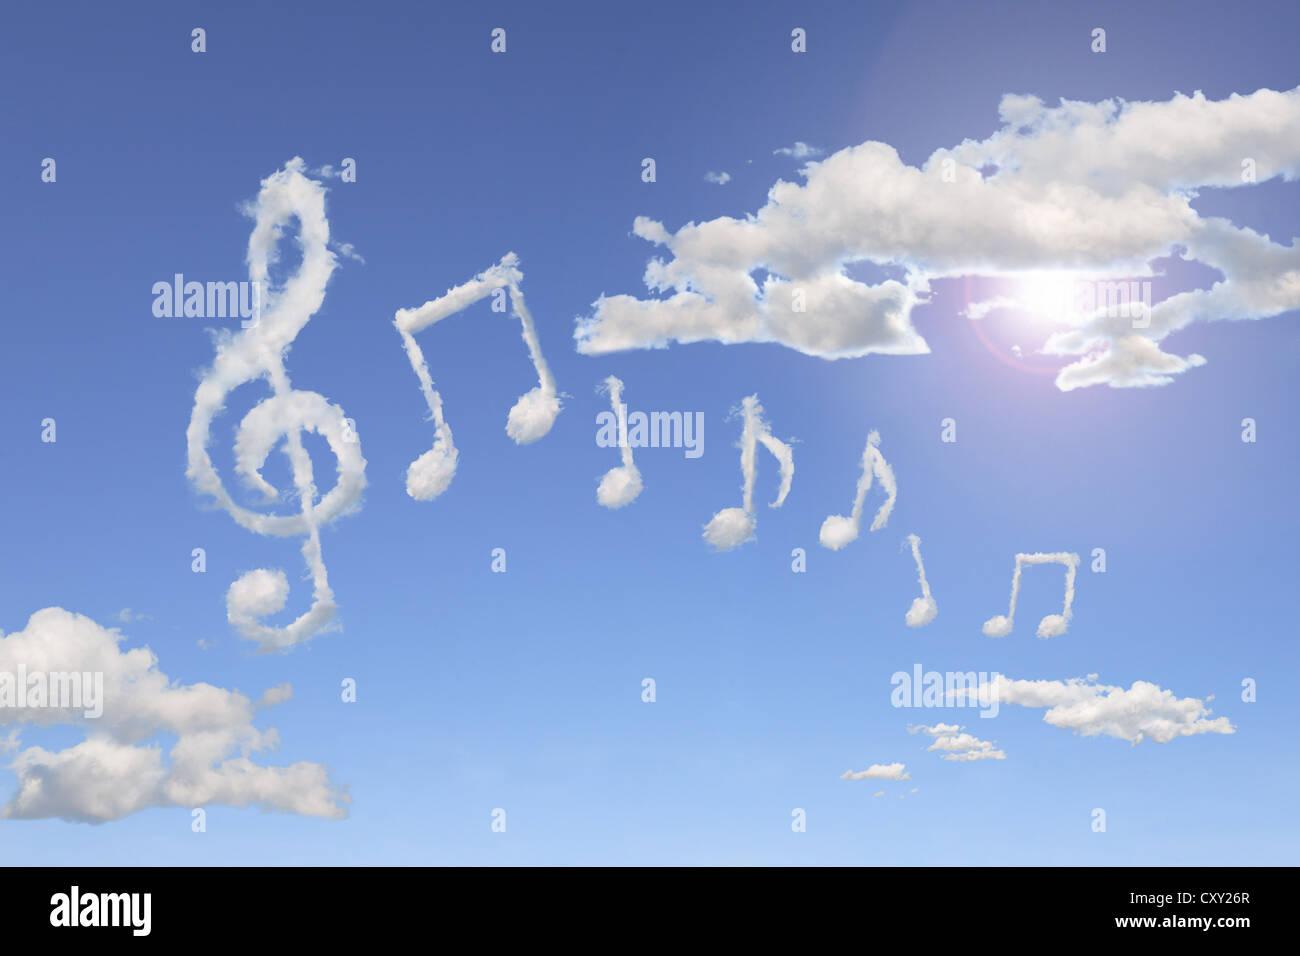 blue sky clouds shaped like music notes illustration stock photo 50996255 alamy. Black Bedroom Furniture Sets. Home Design Ideas